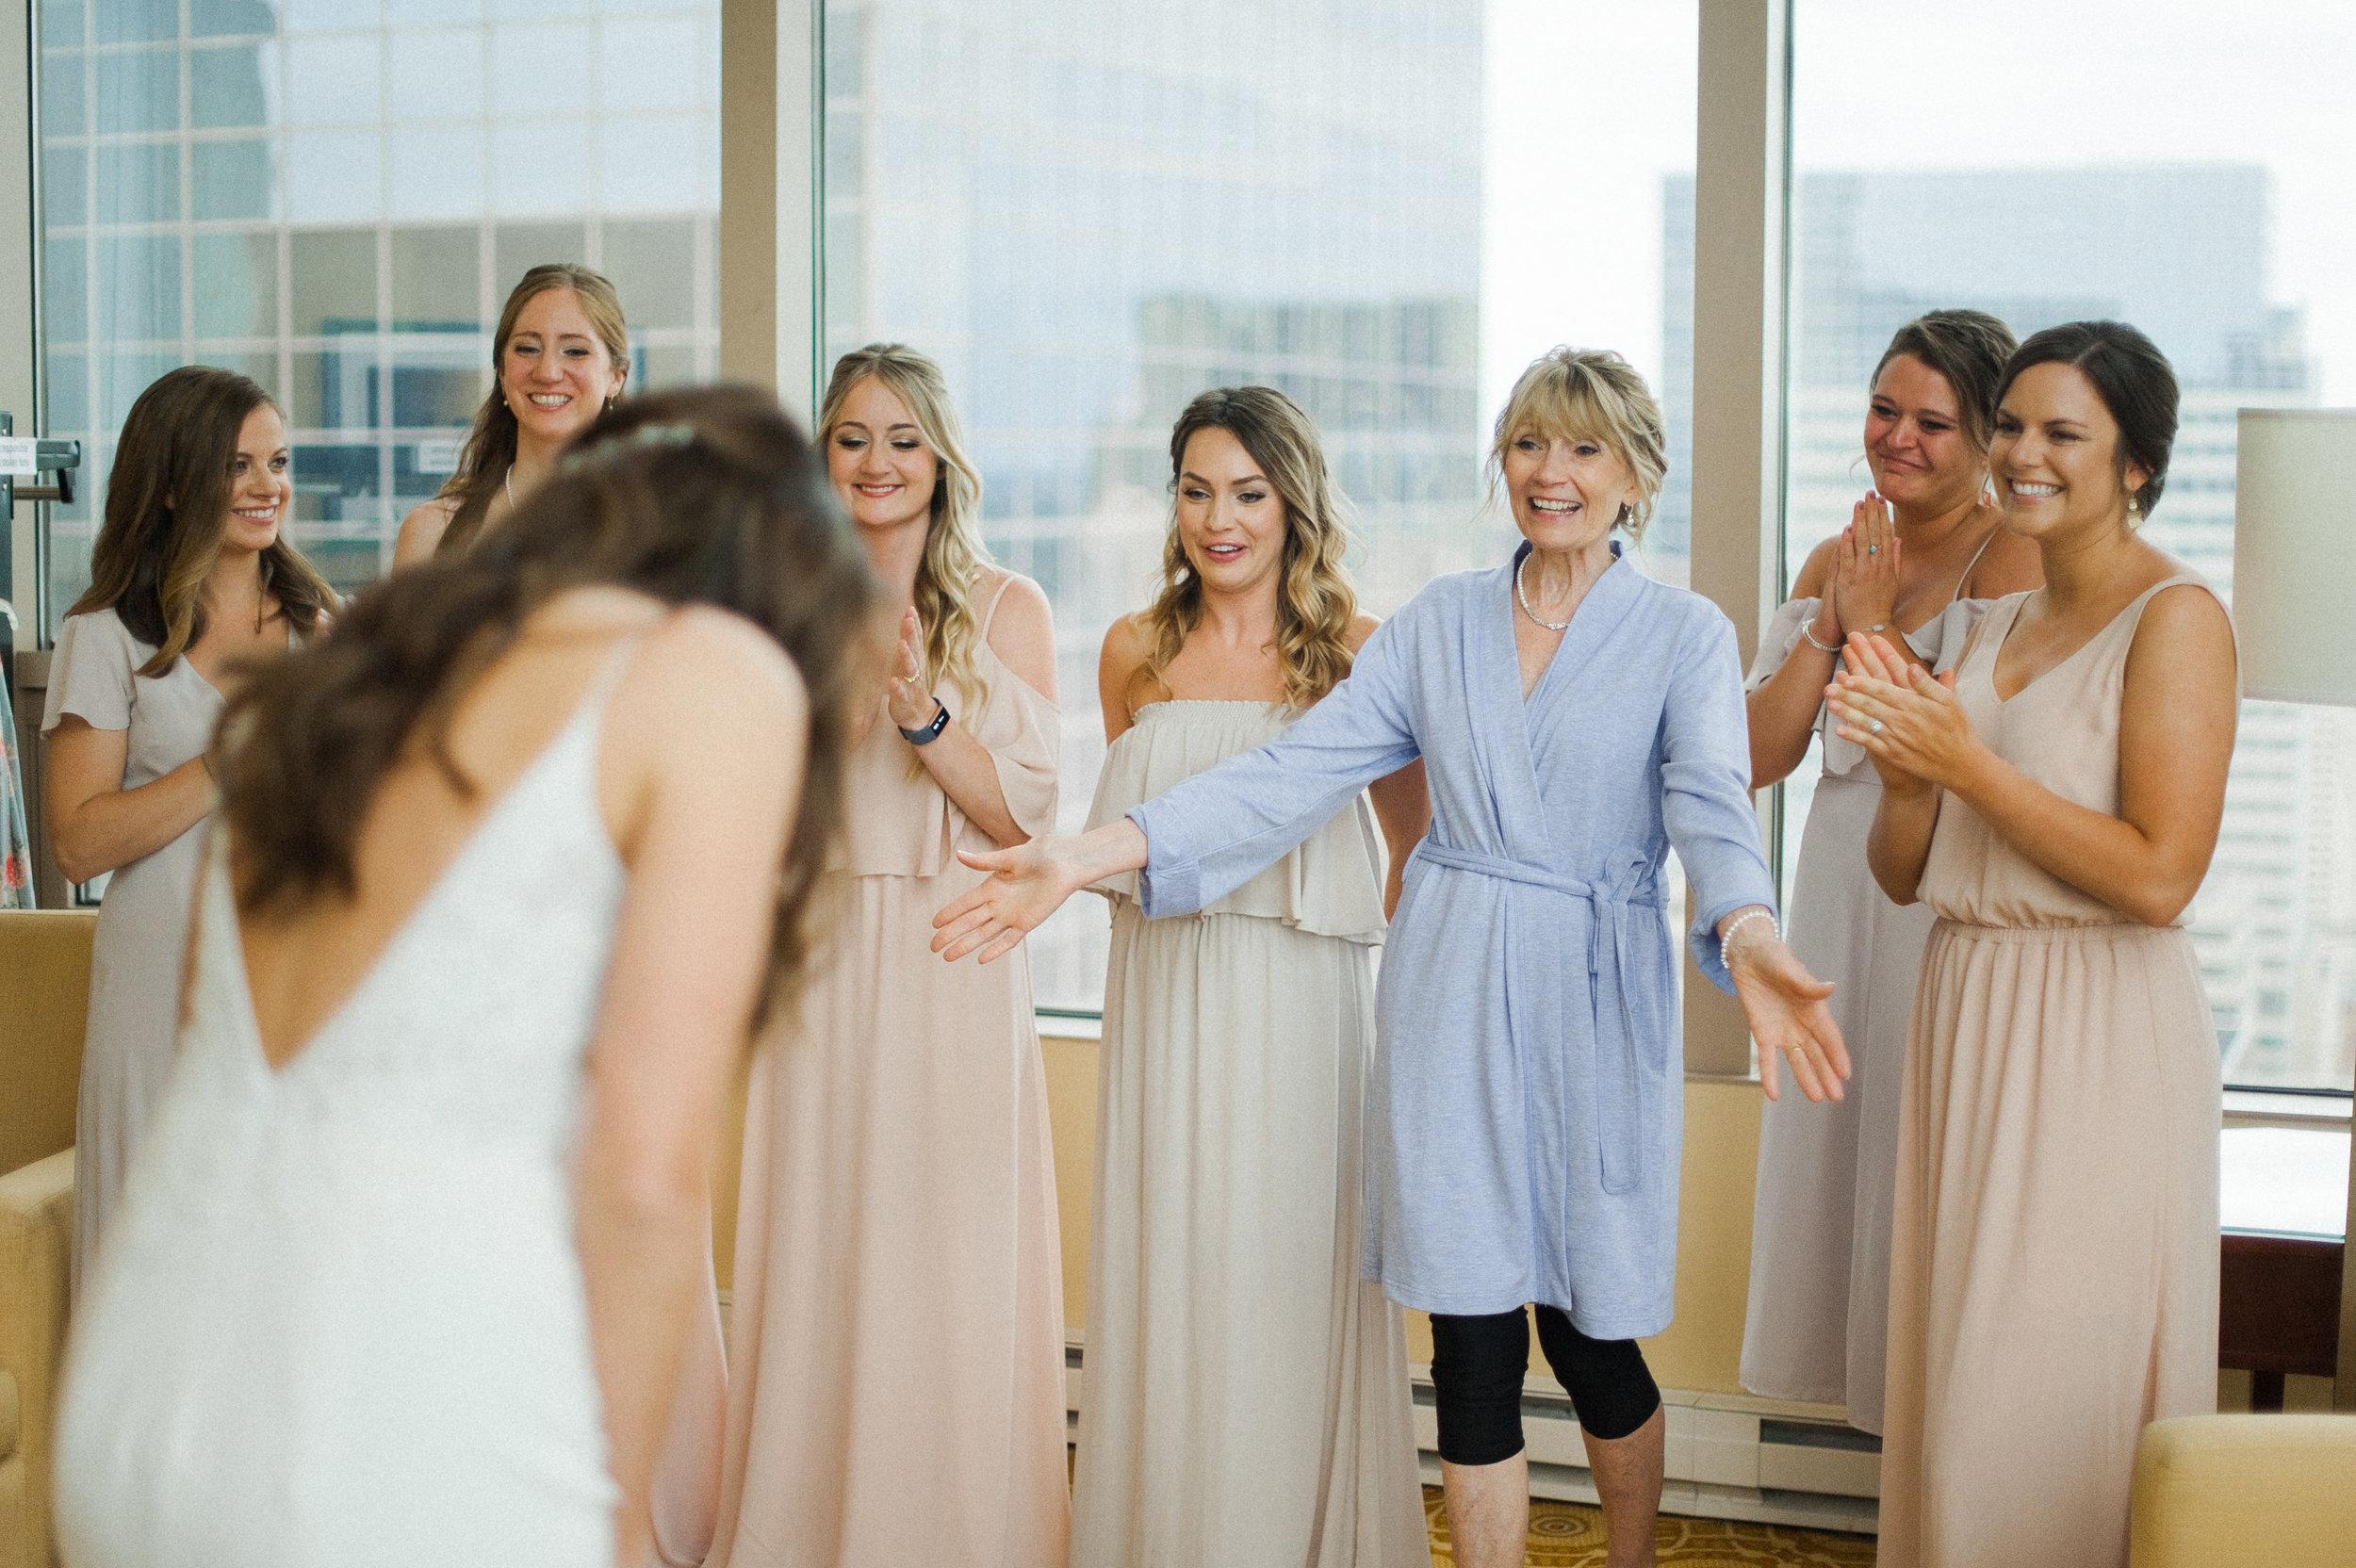 Bridesmaids-Bride-First-Look.jpg